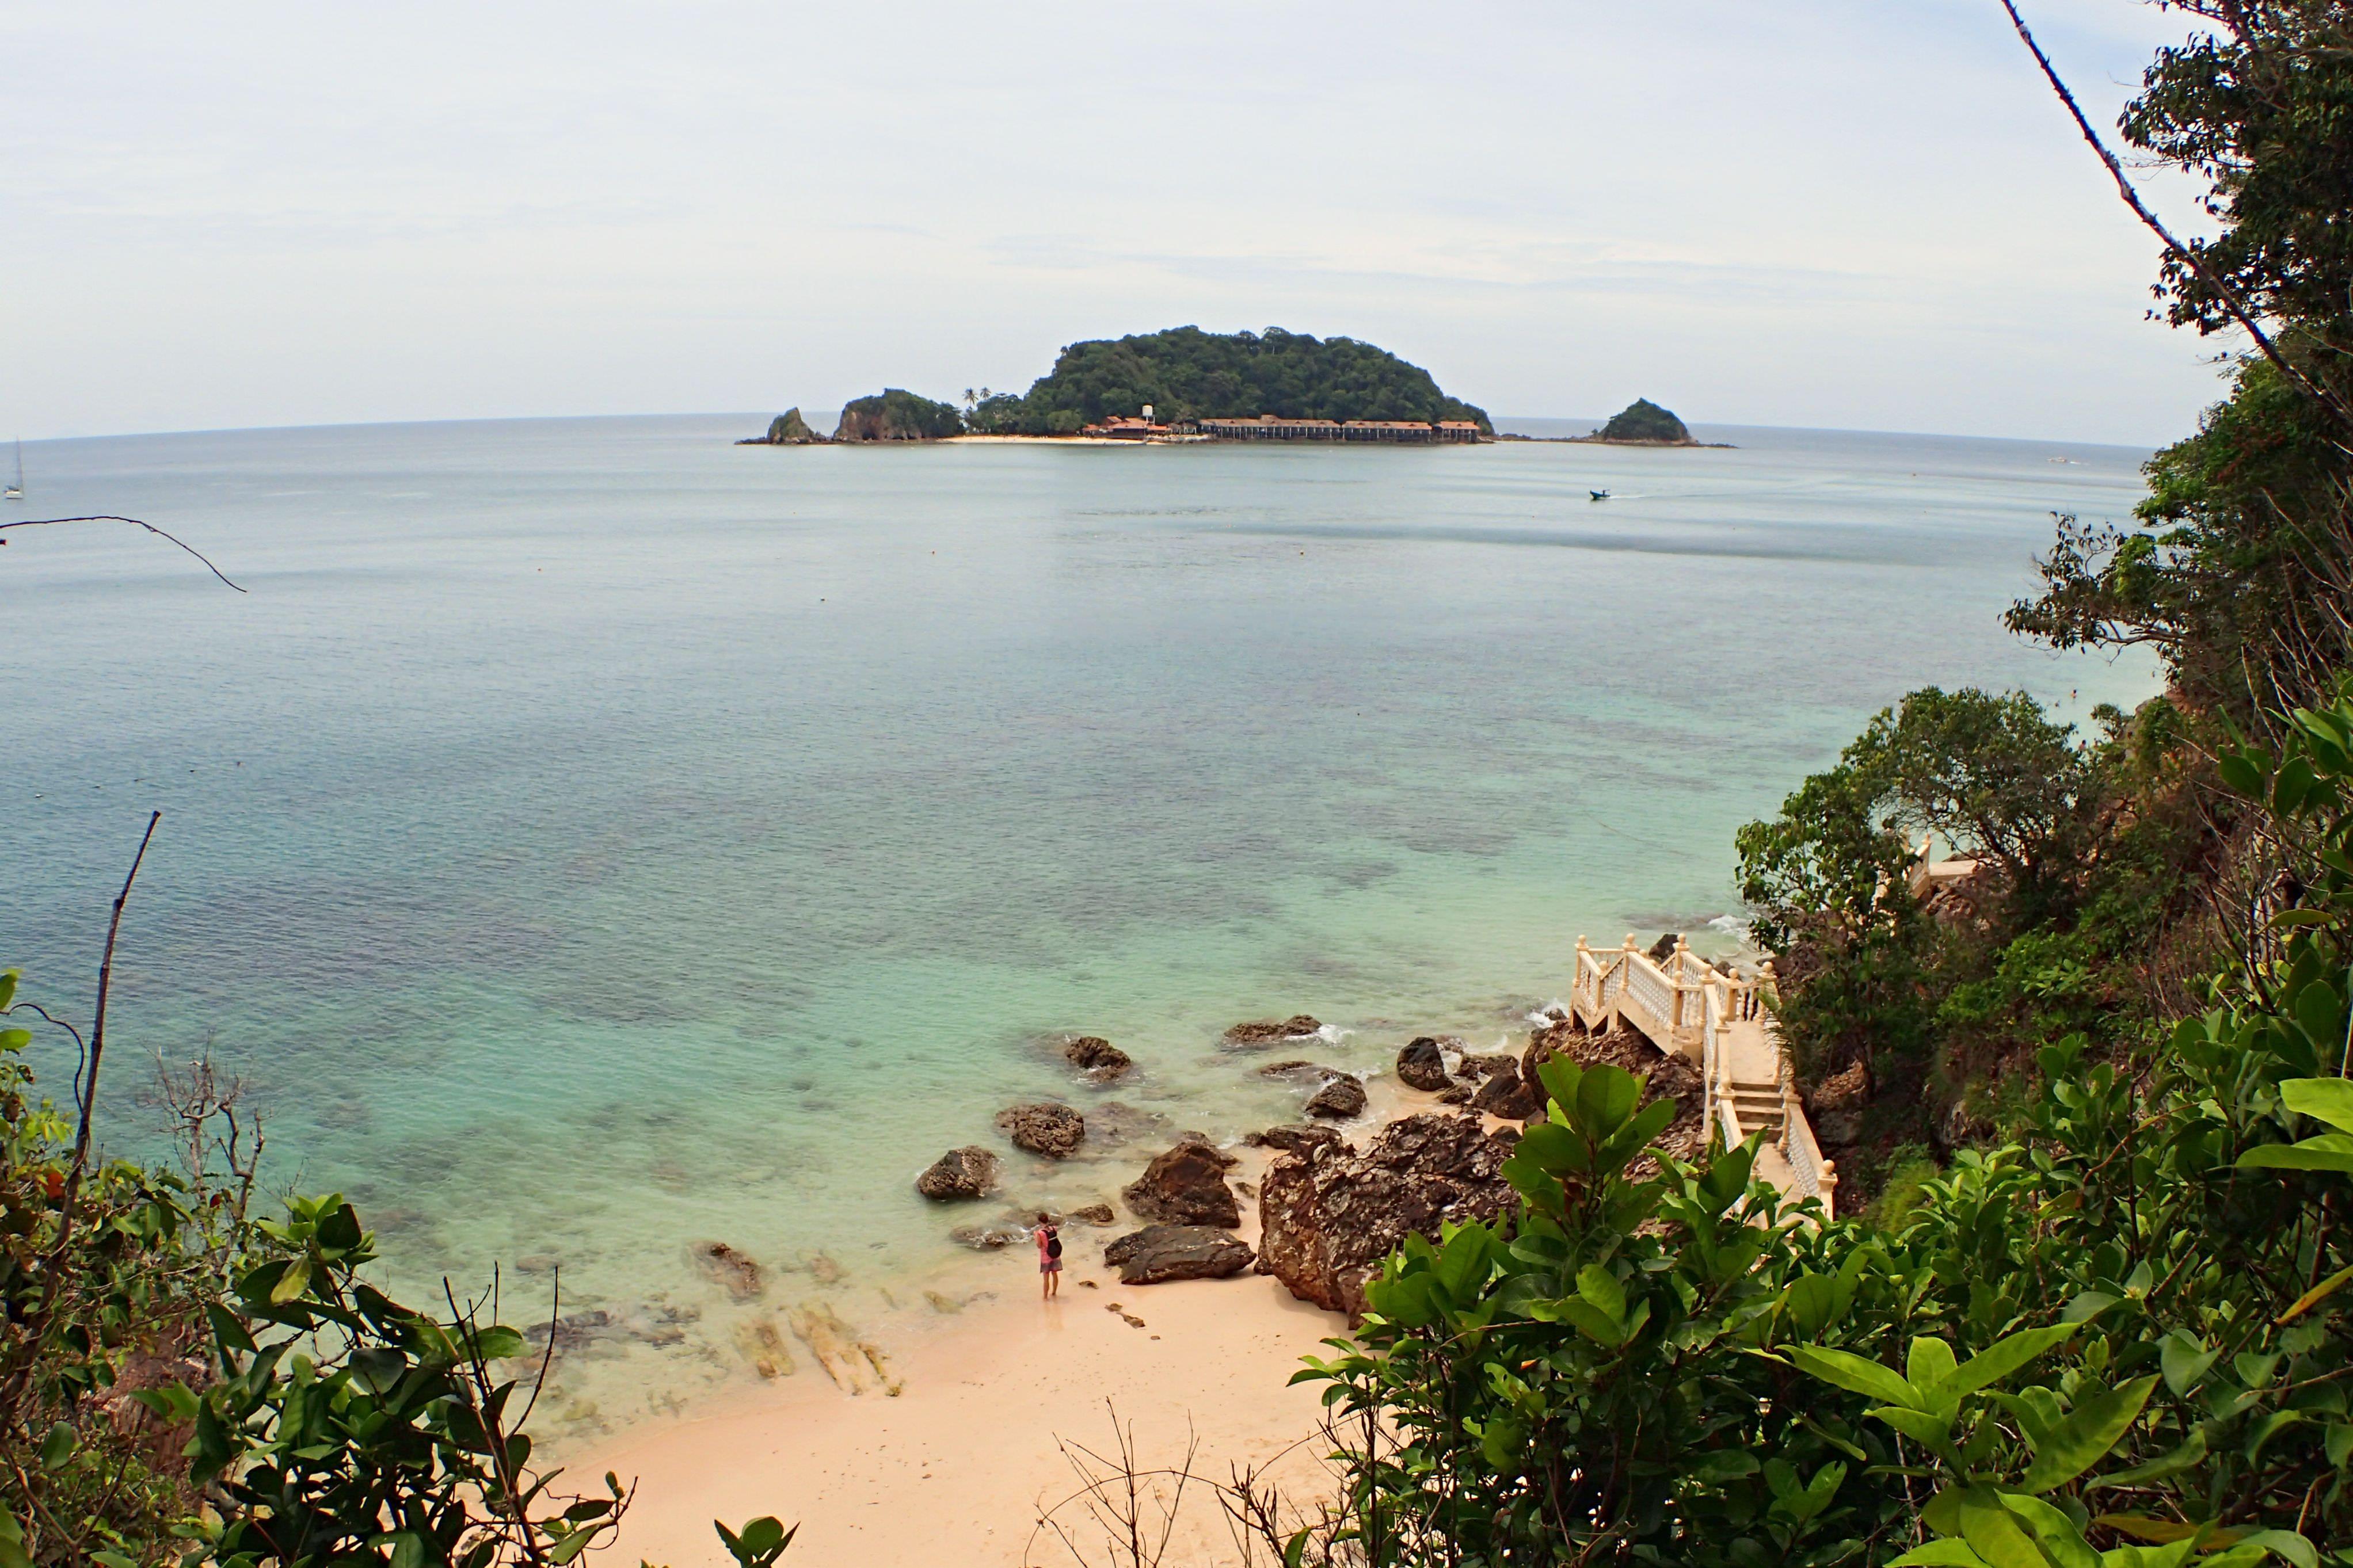 Pulau kapas 11